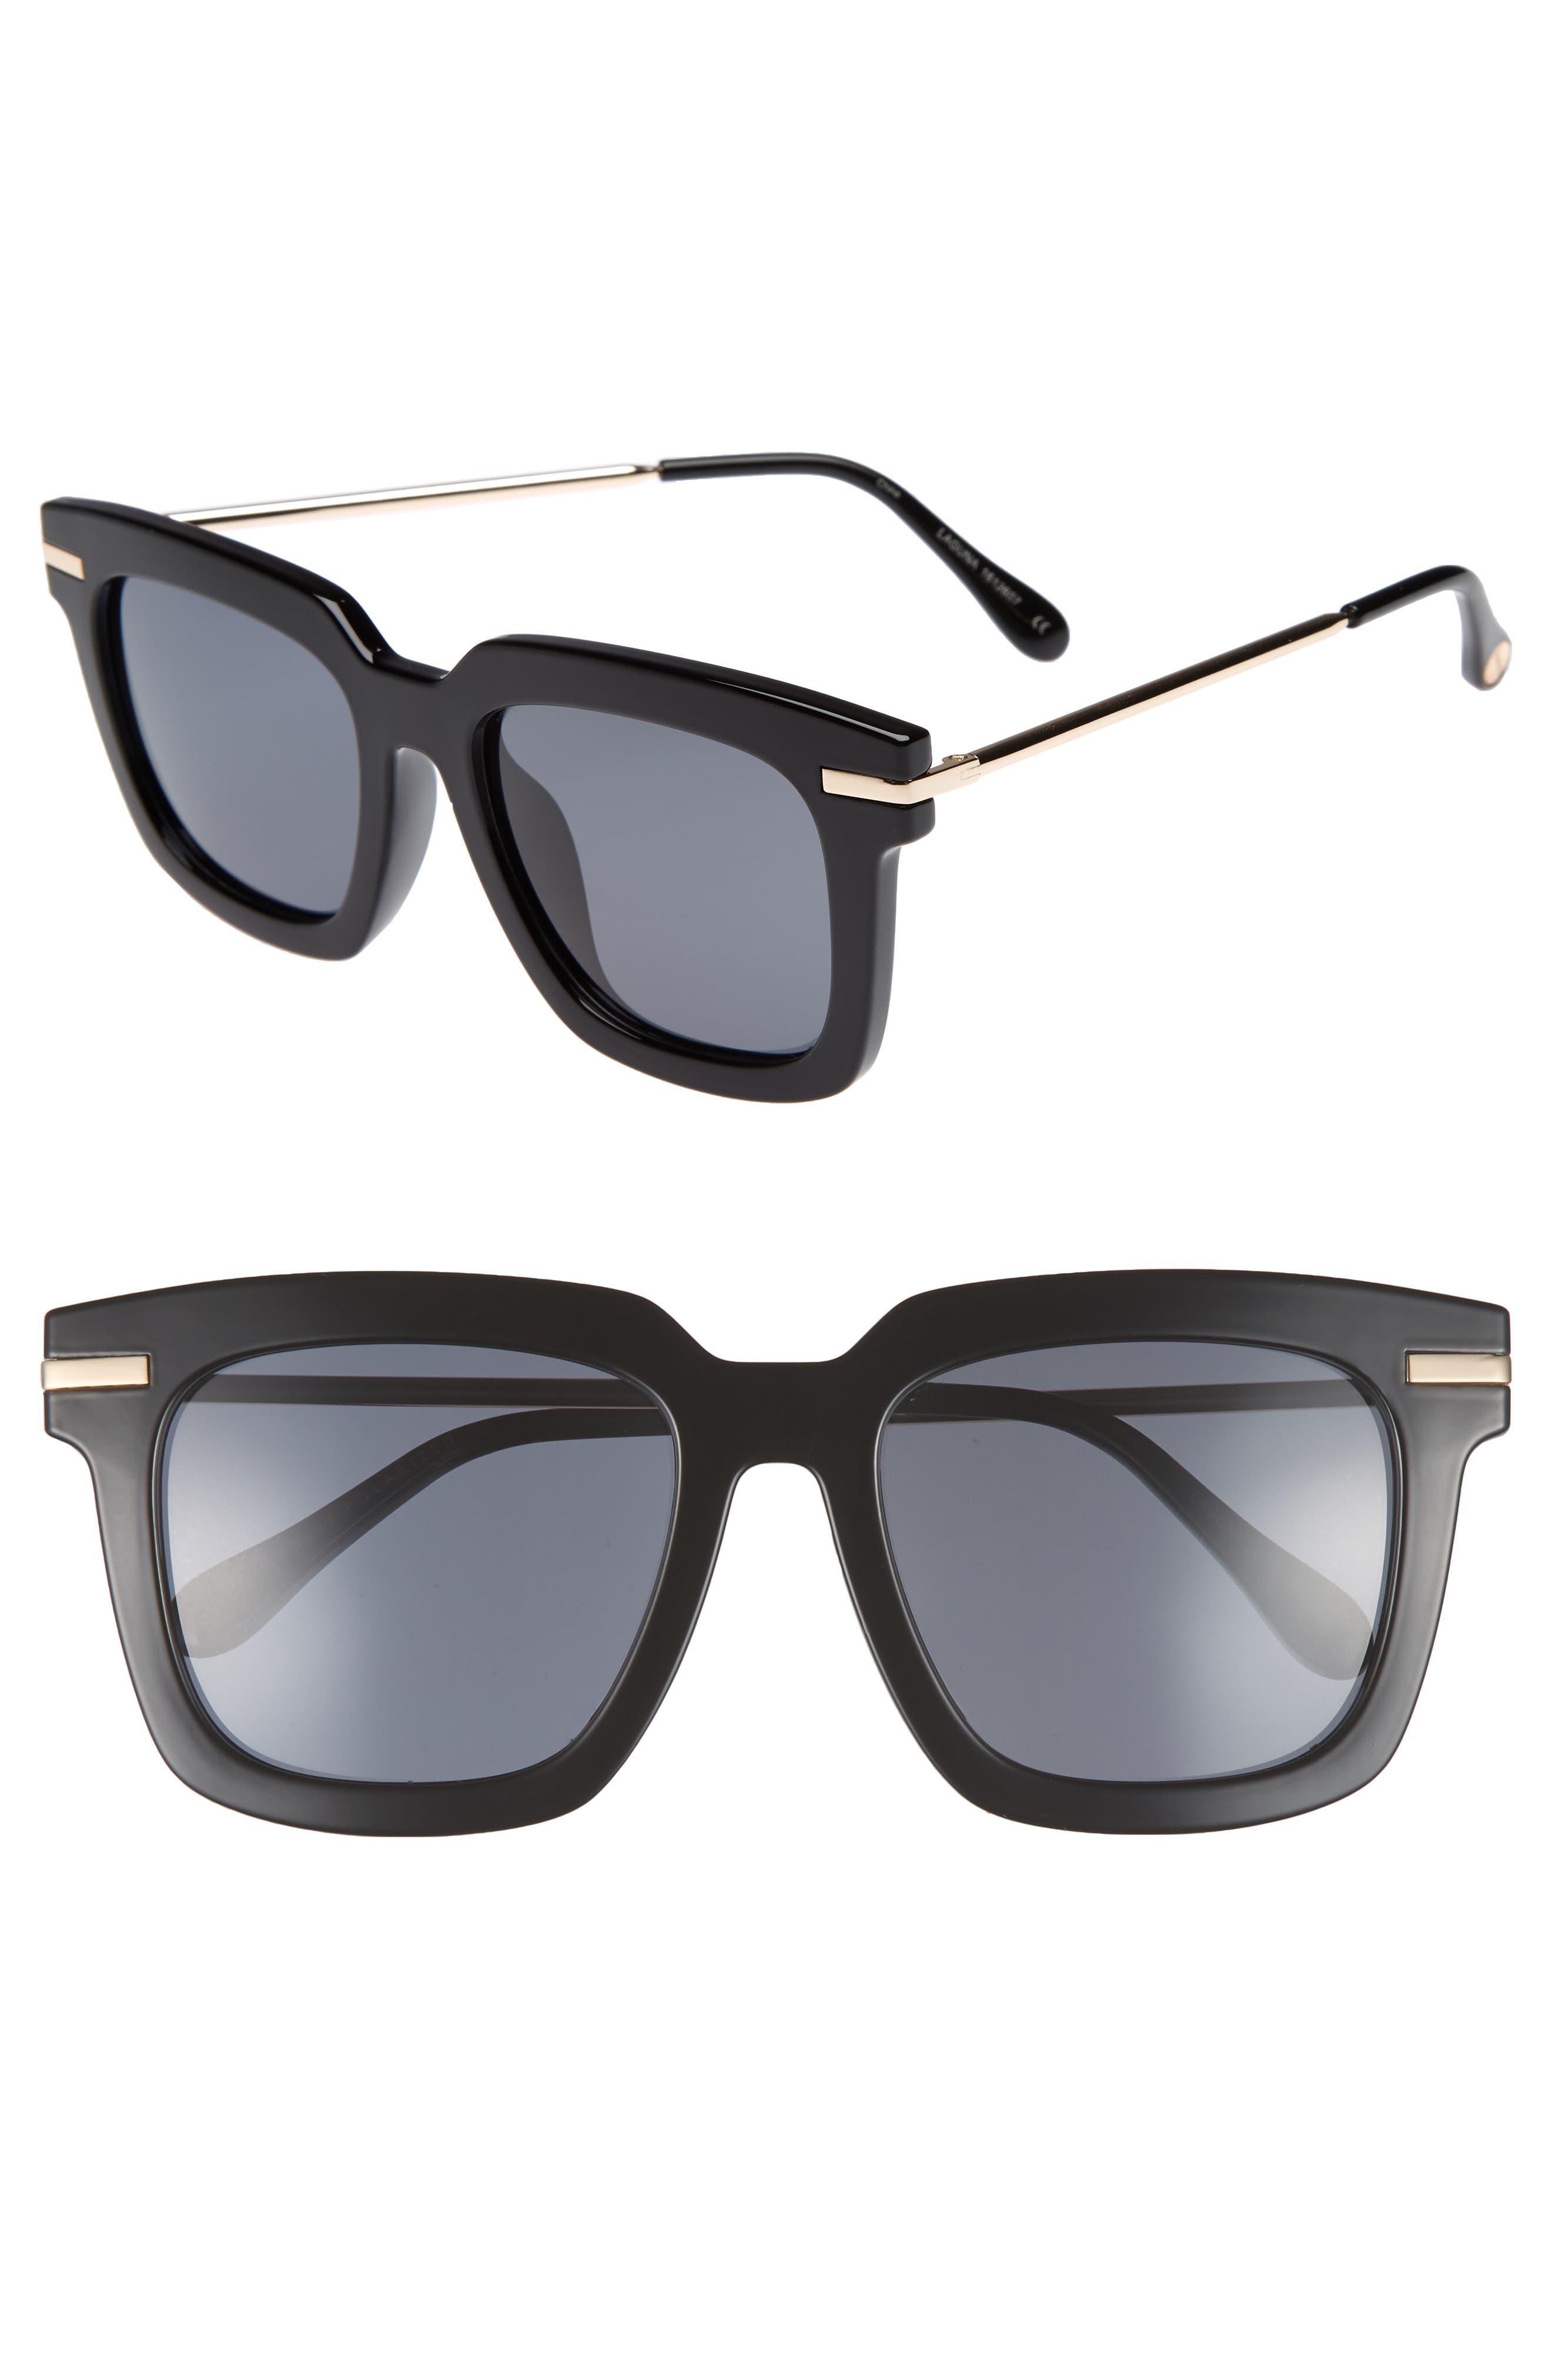 Laguna 51mm Polarized Sunglasses,                             Main thumbnail 1, color,                             001